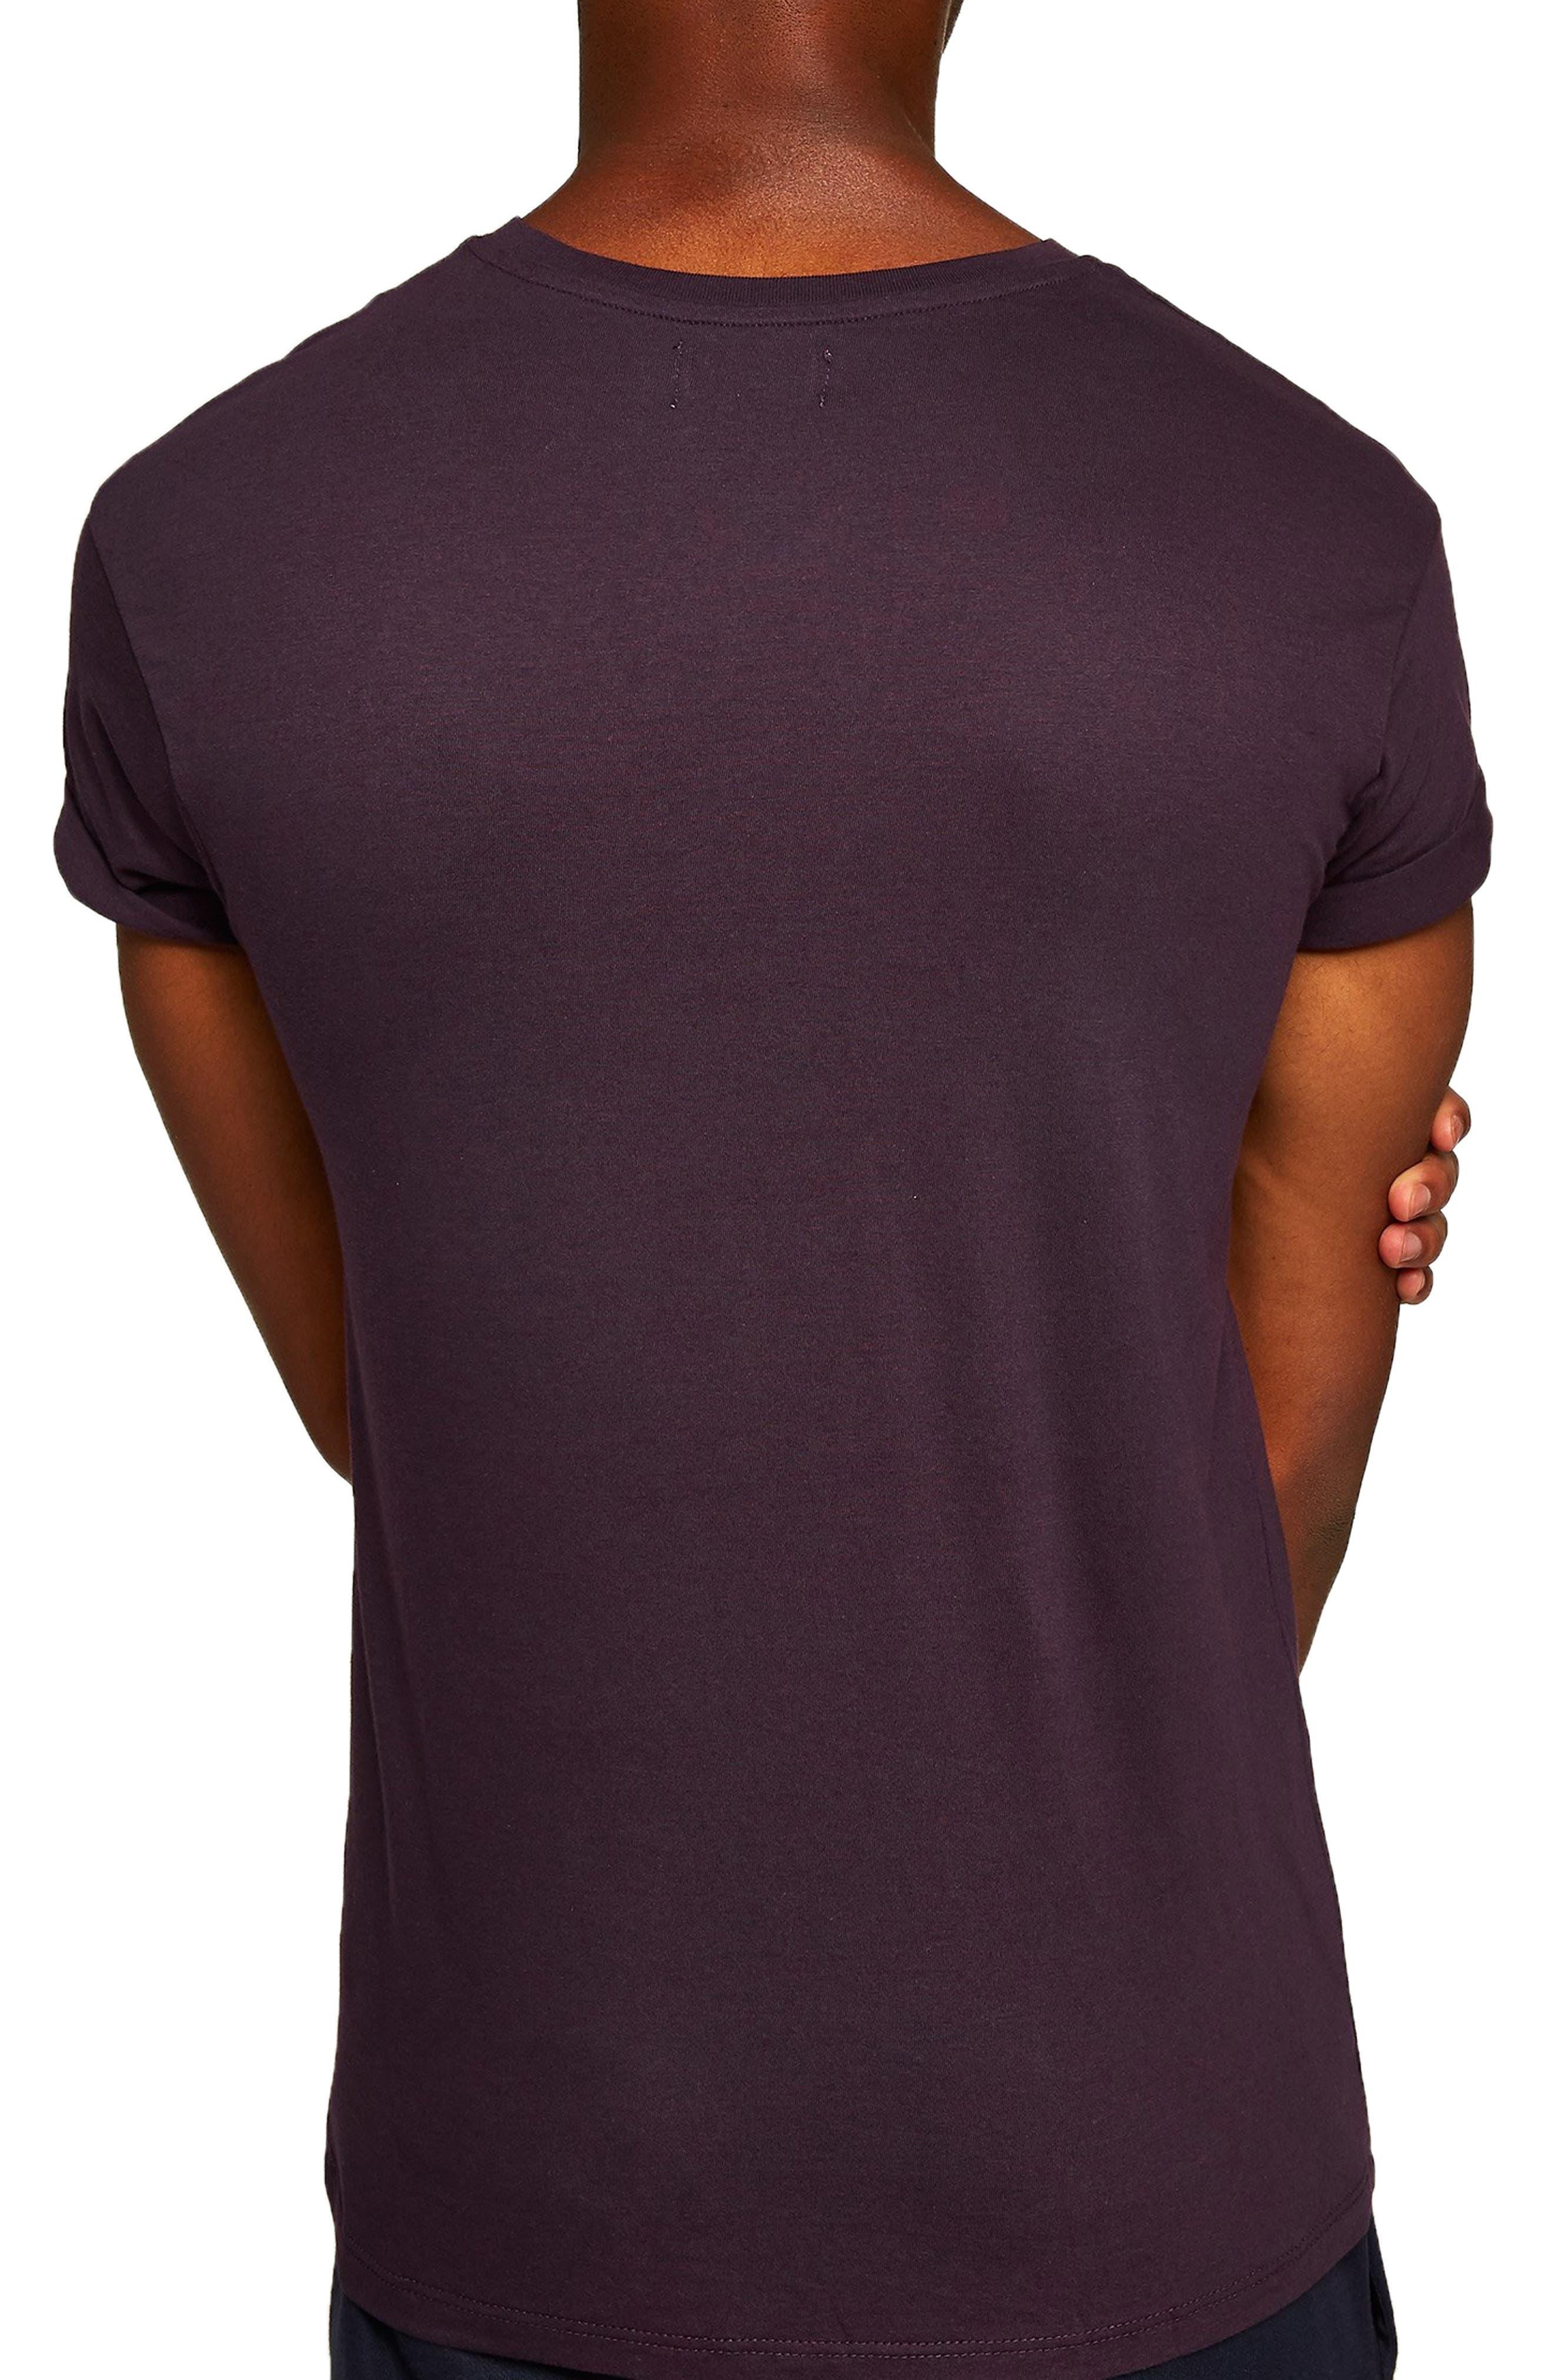 Muscle Fit Roller T-Shirt,                             Alternate thumbnail 2, color,                             PURPLE